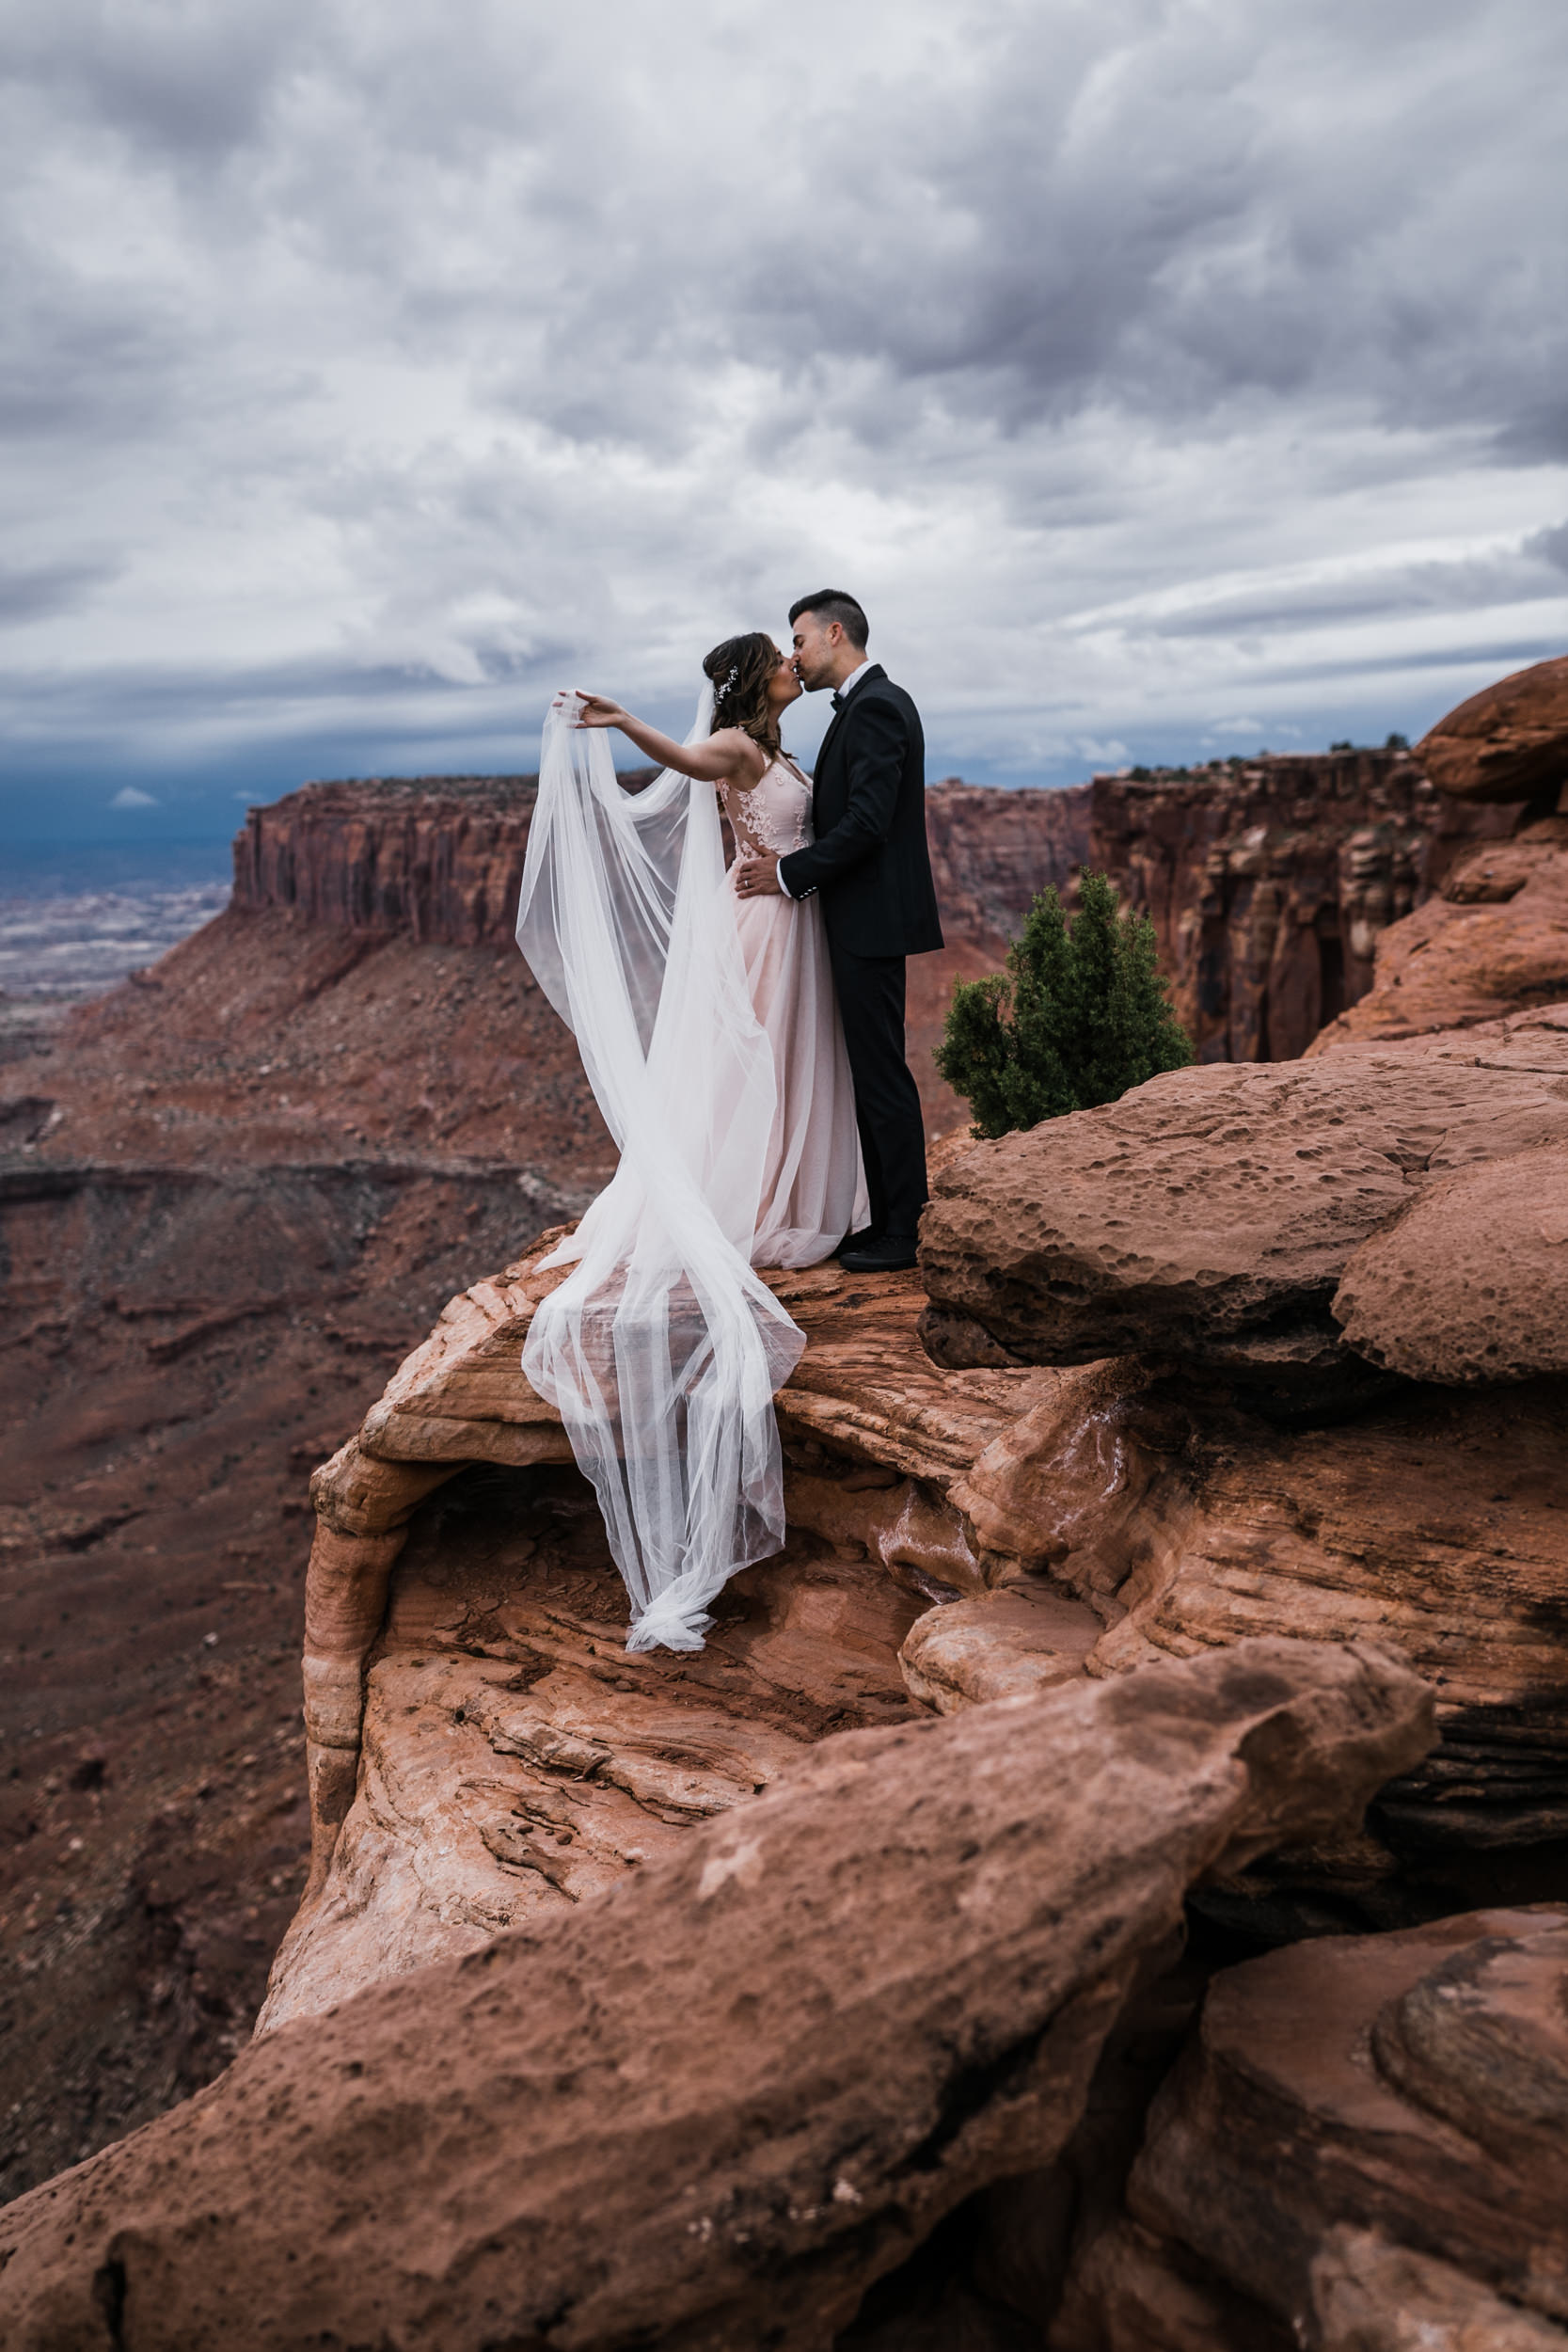 Hearnes-Elopement-Photography-Canyonlands-National-Park-Moab-Wedding-13.jpg